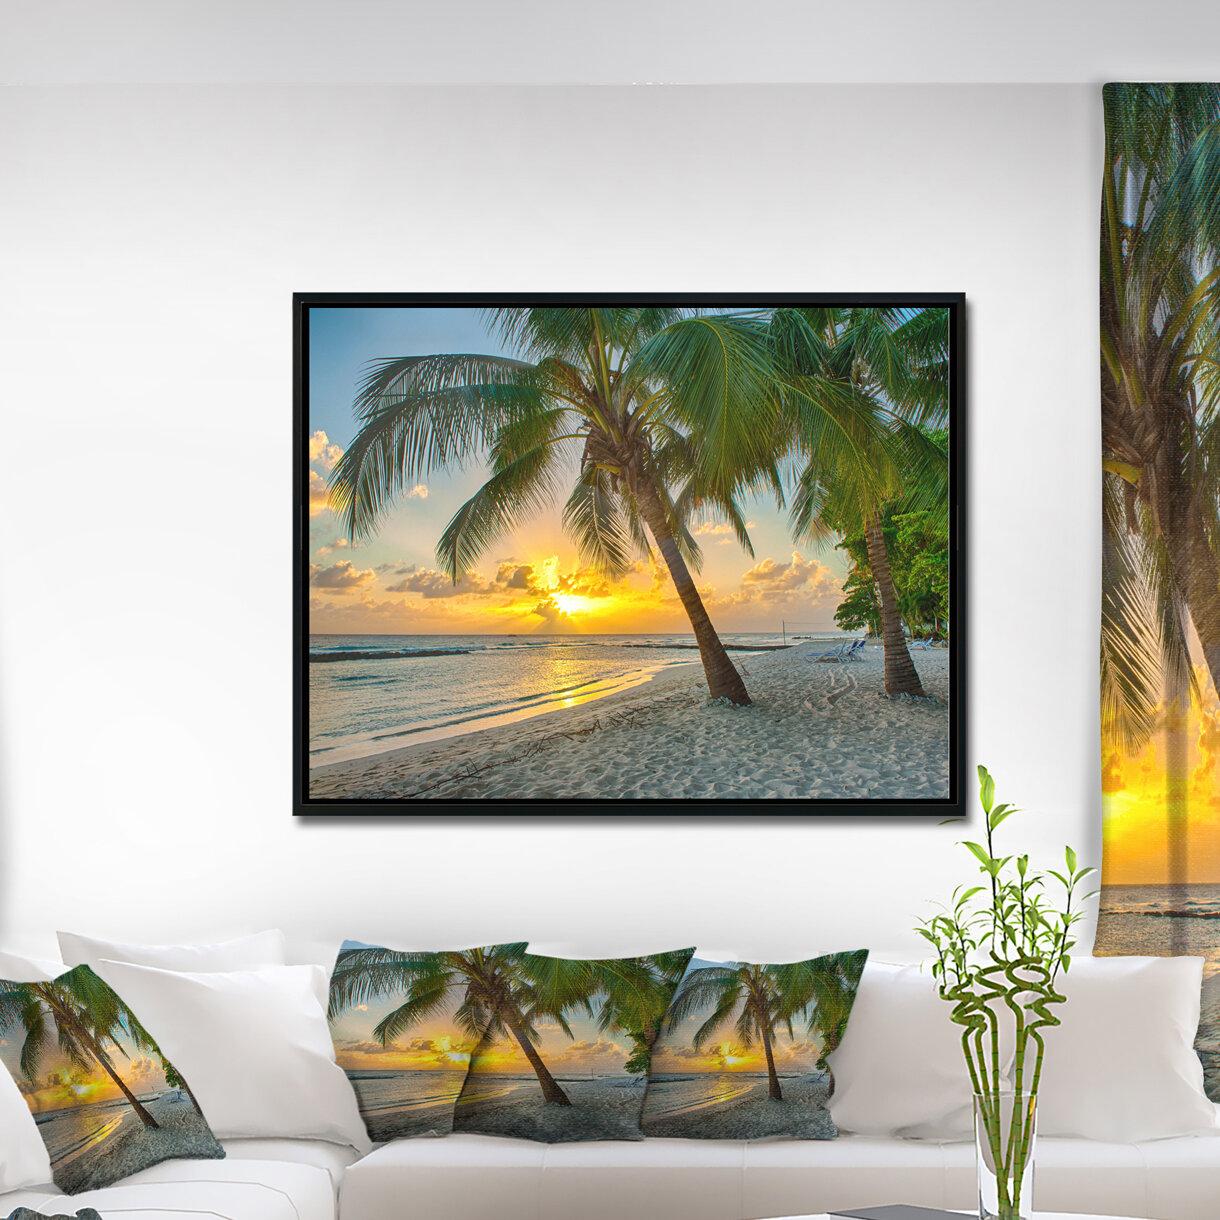 East Urban Home 'Beach In Caribbean Island Of Barbados